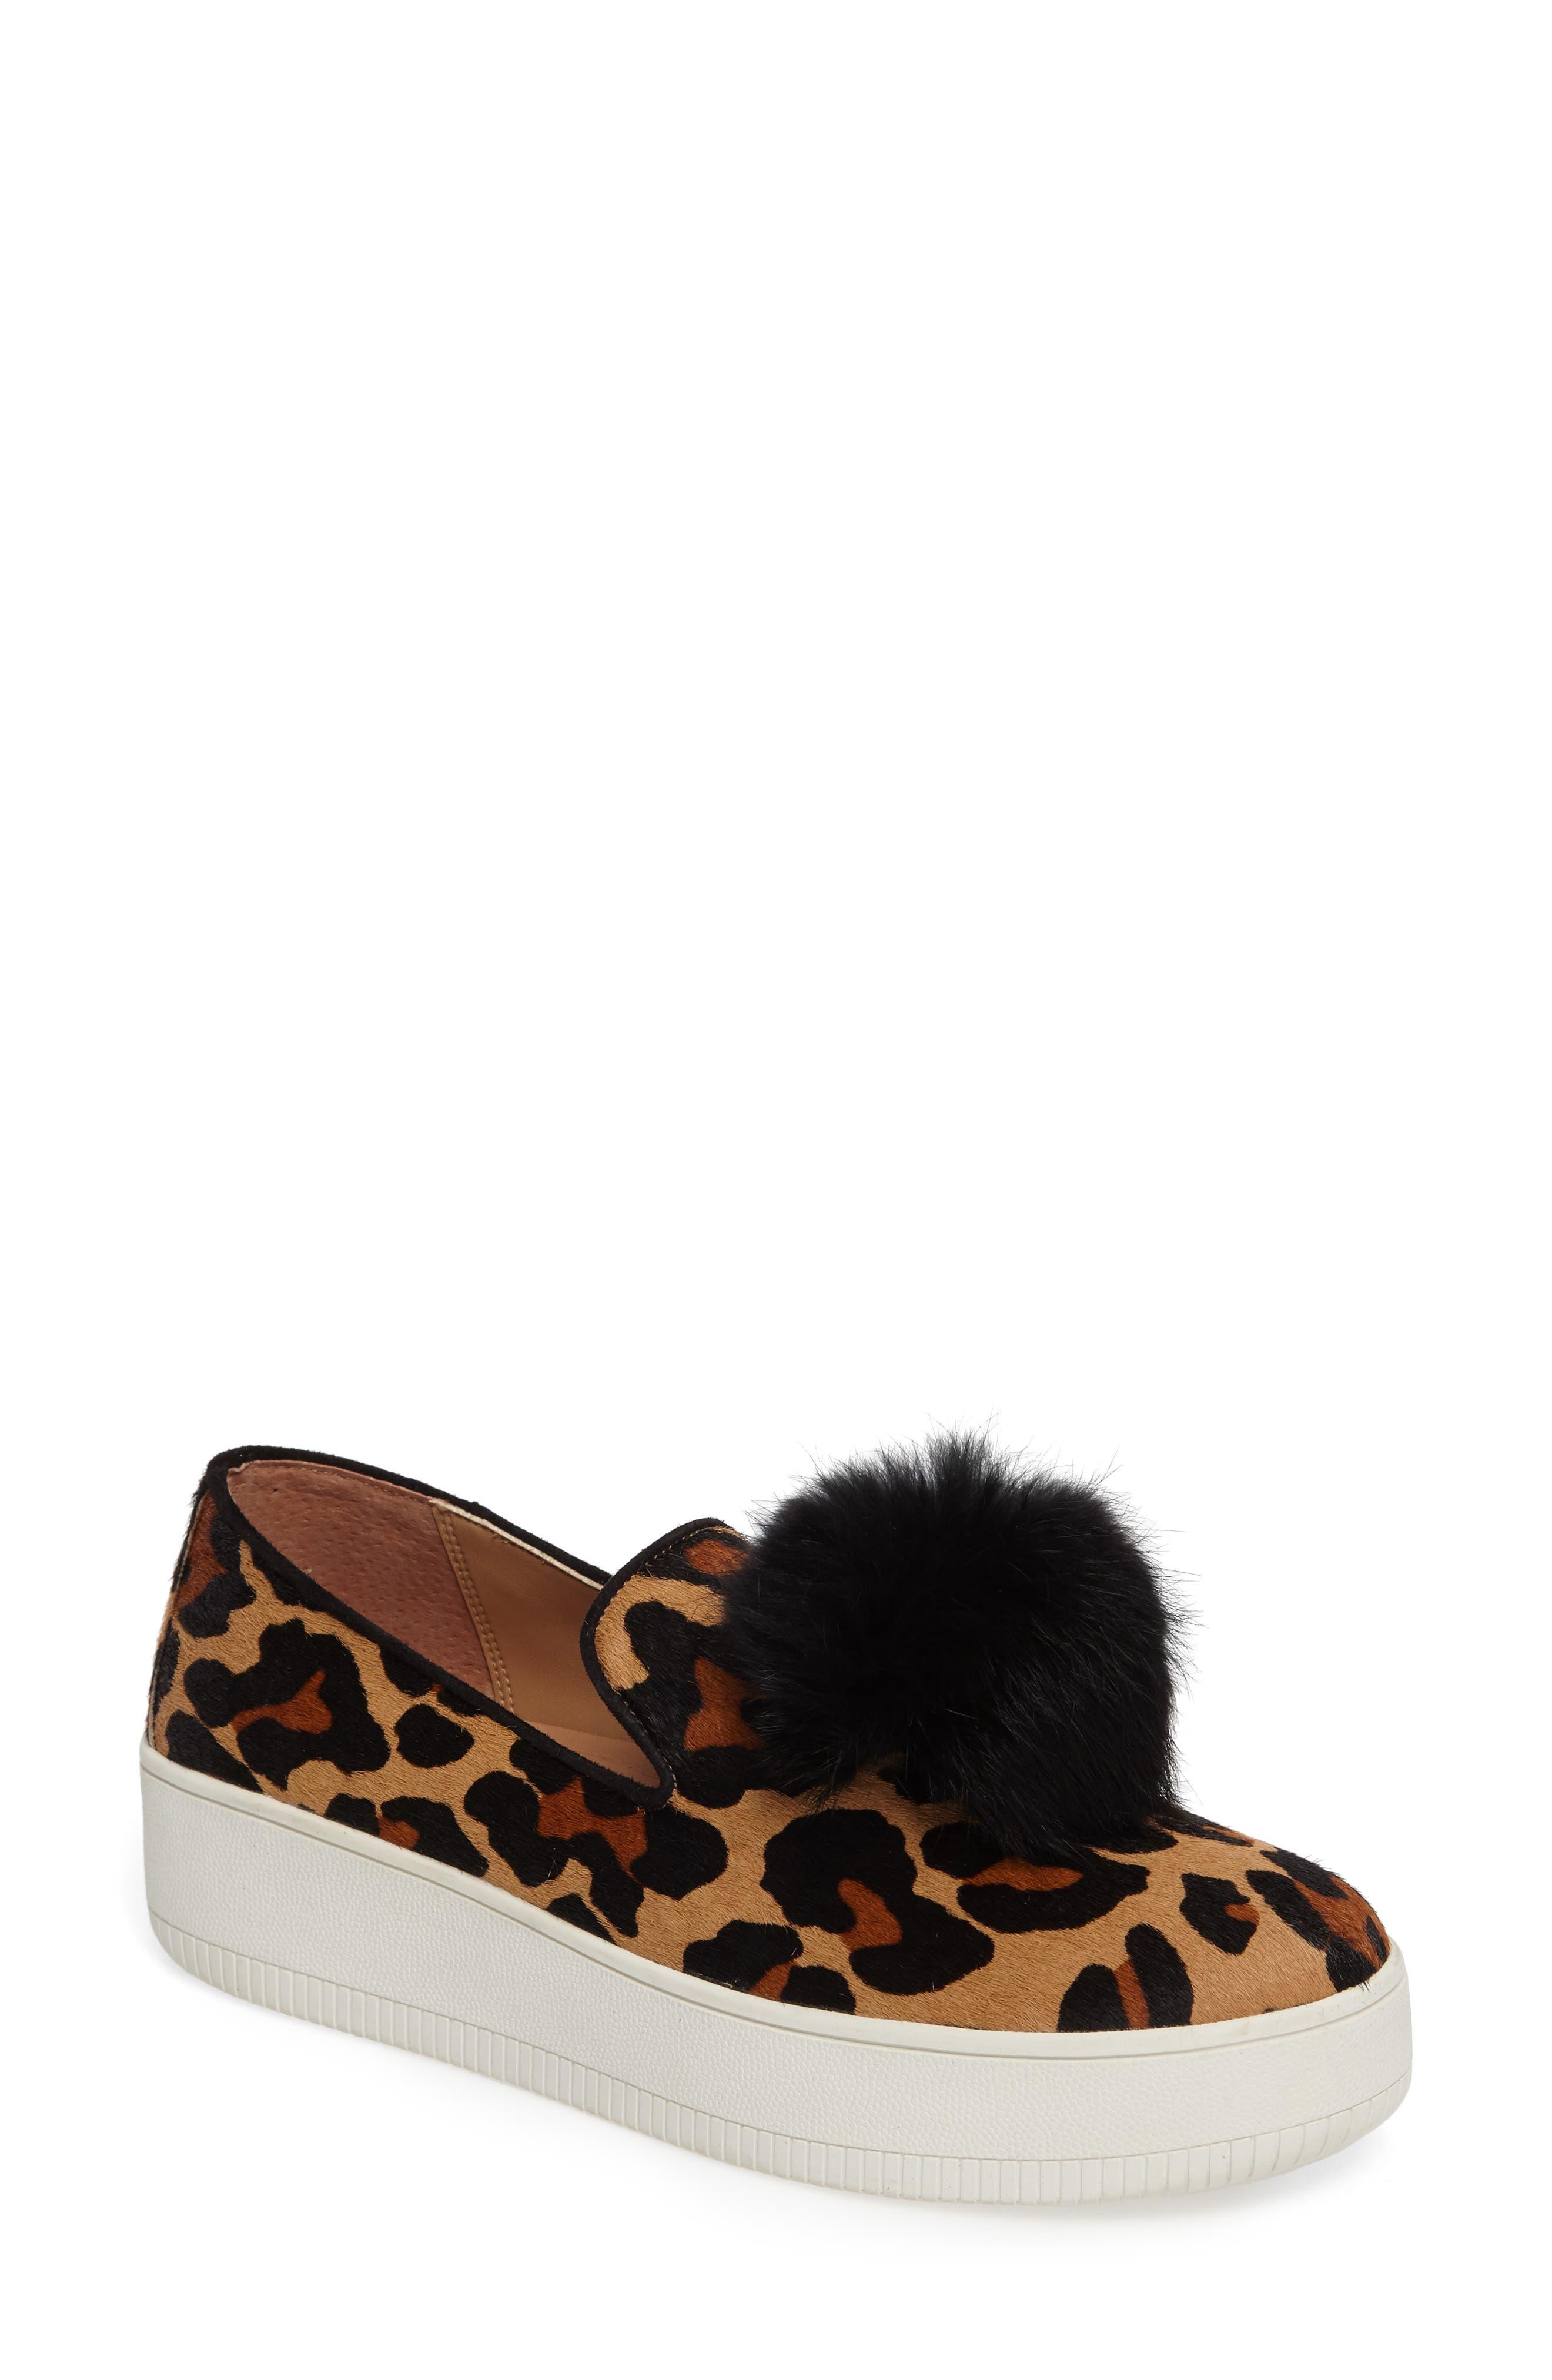 Linea Paolo Sammy II Genuine Calf Hair Platform Sneaker with Genuine Rabbit Fur Trim (Women)